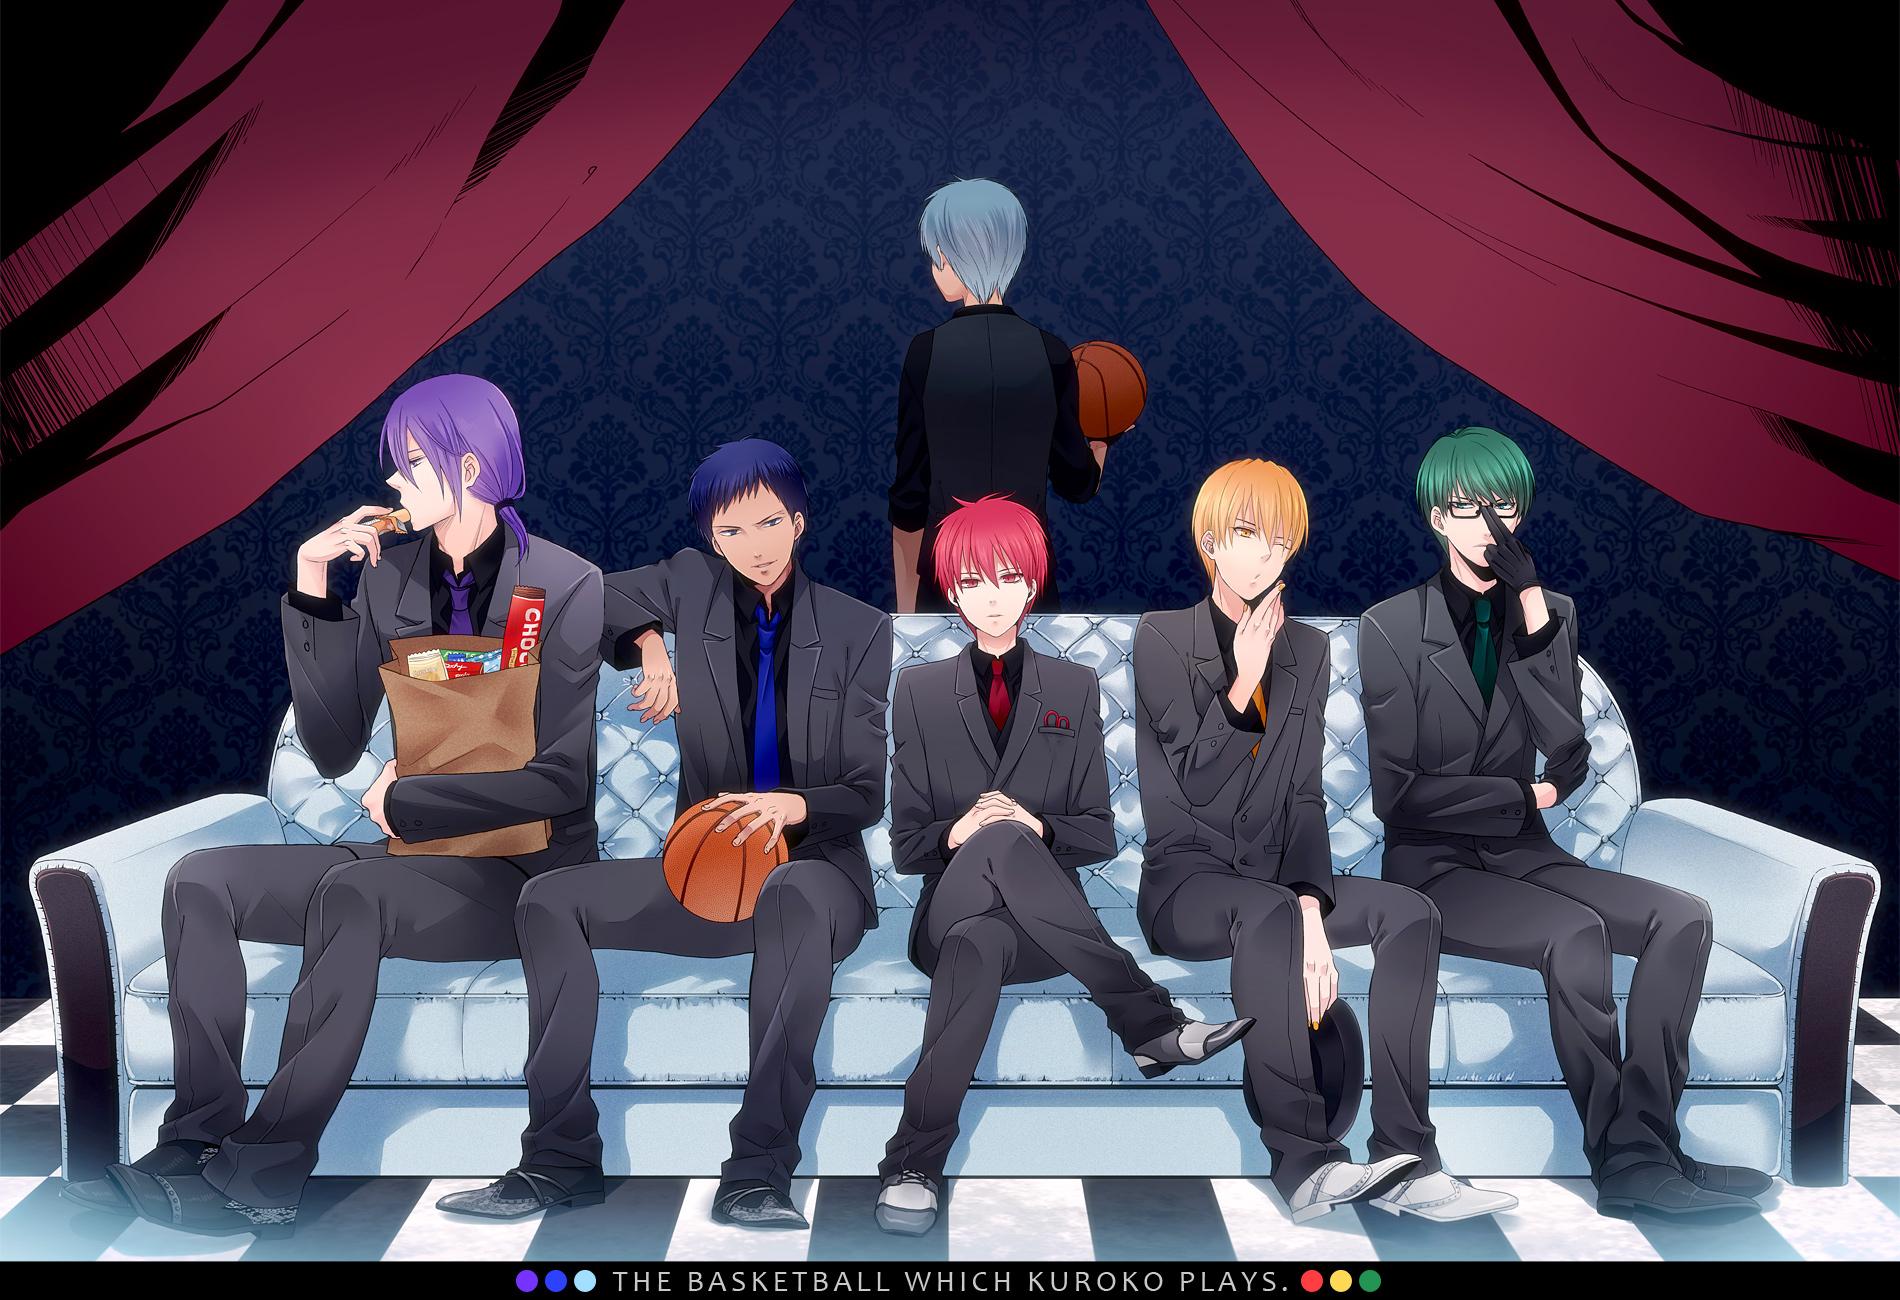 kurokos basketball wallpaper and background image